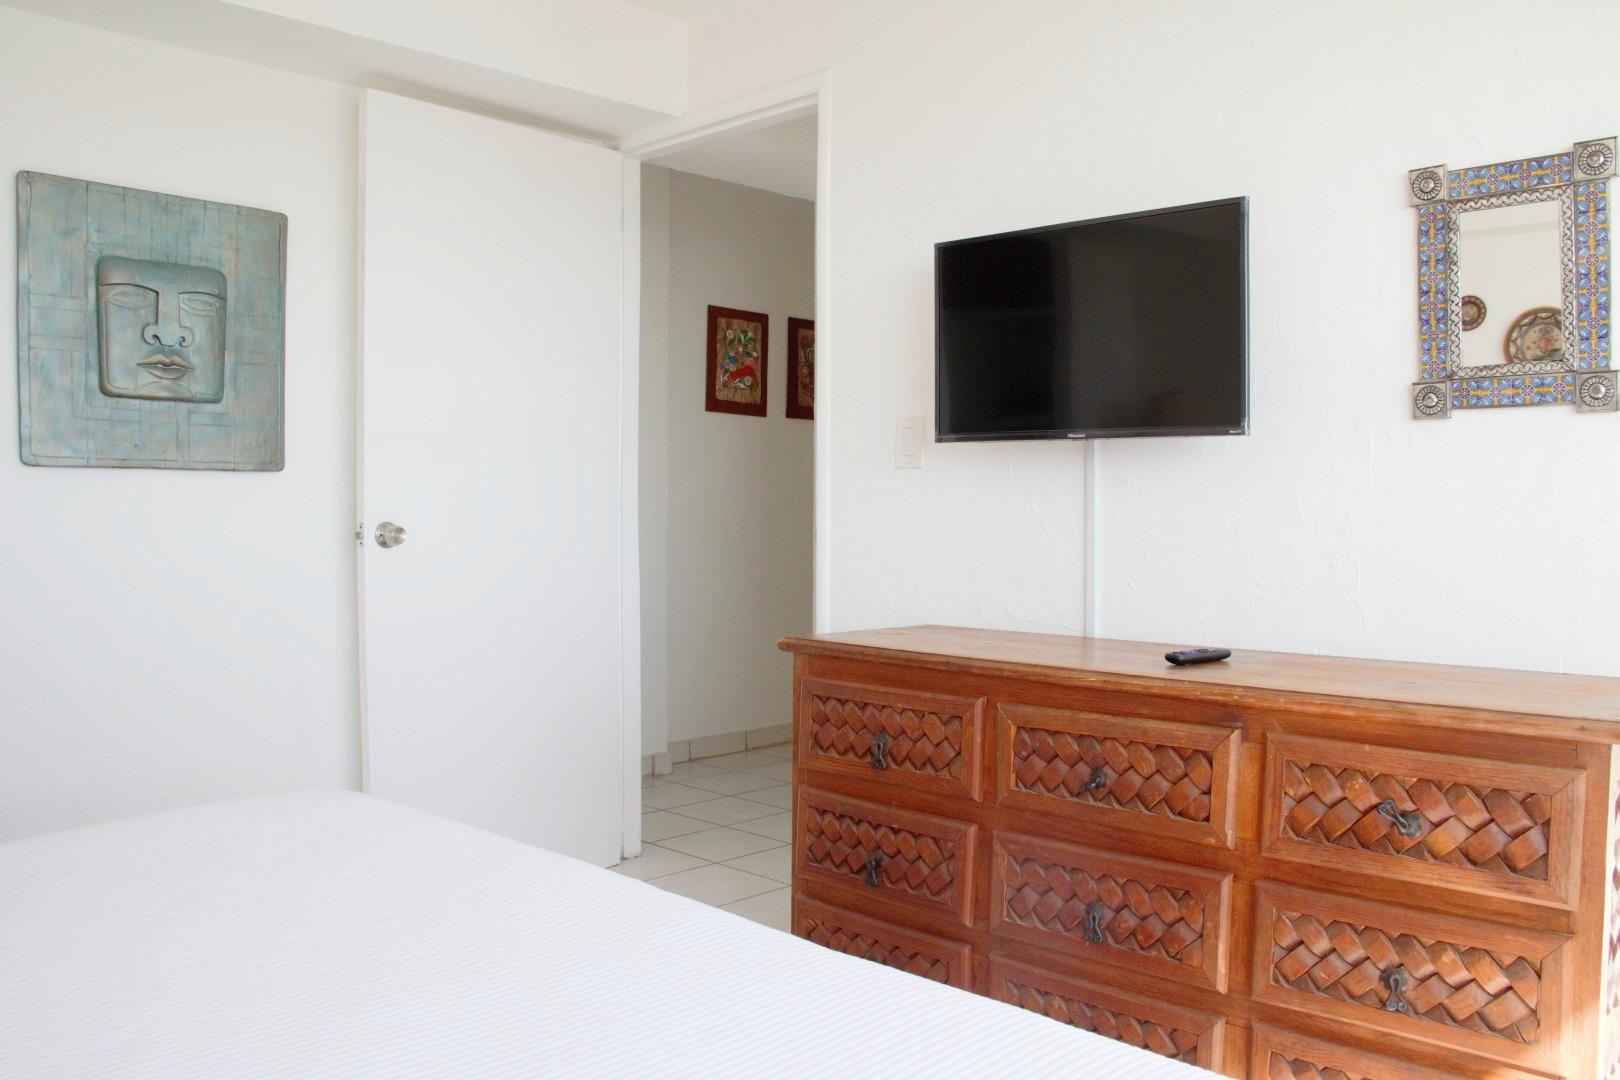 Dresser and smart TV in master bedroom.